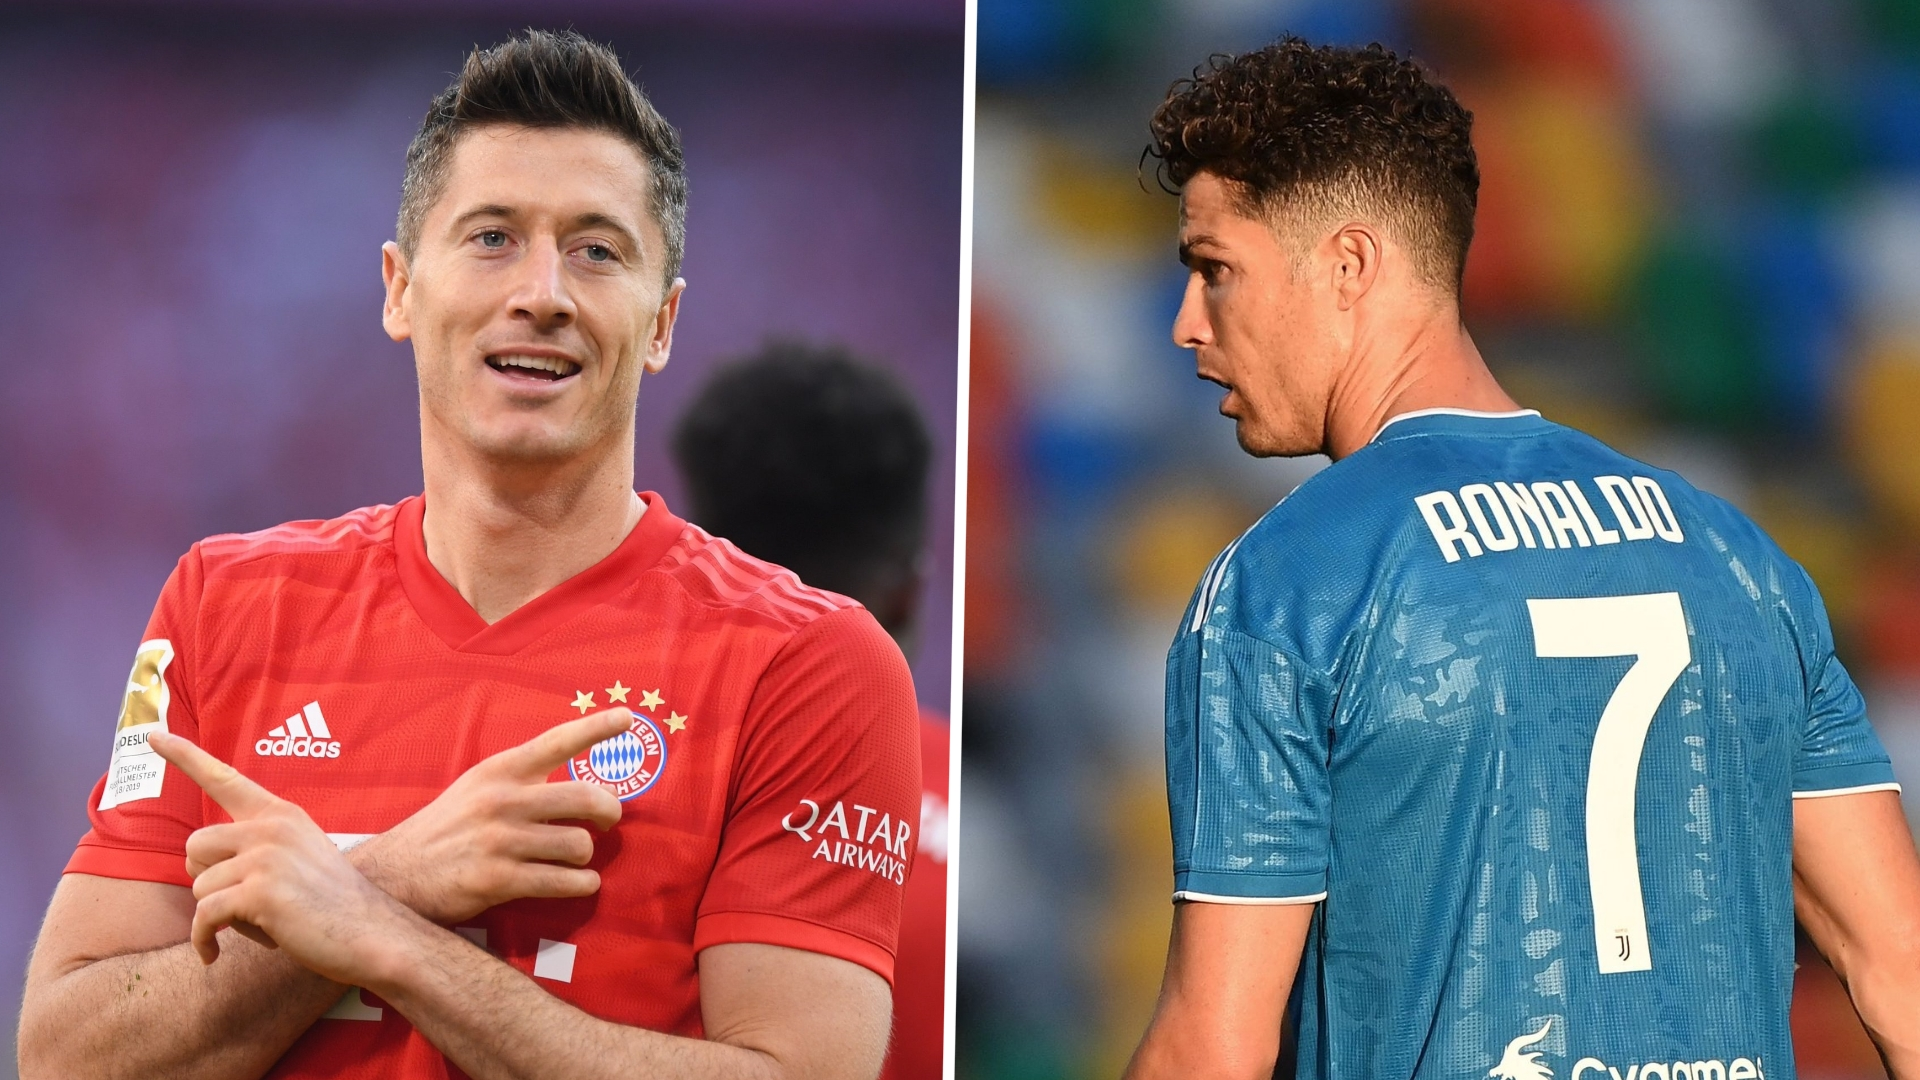 Lewandowski matches Ronaldo feat to join exclusive Champions League club